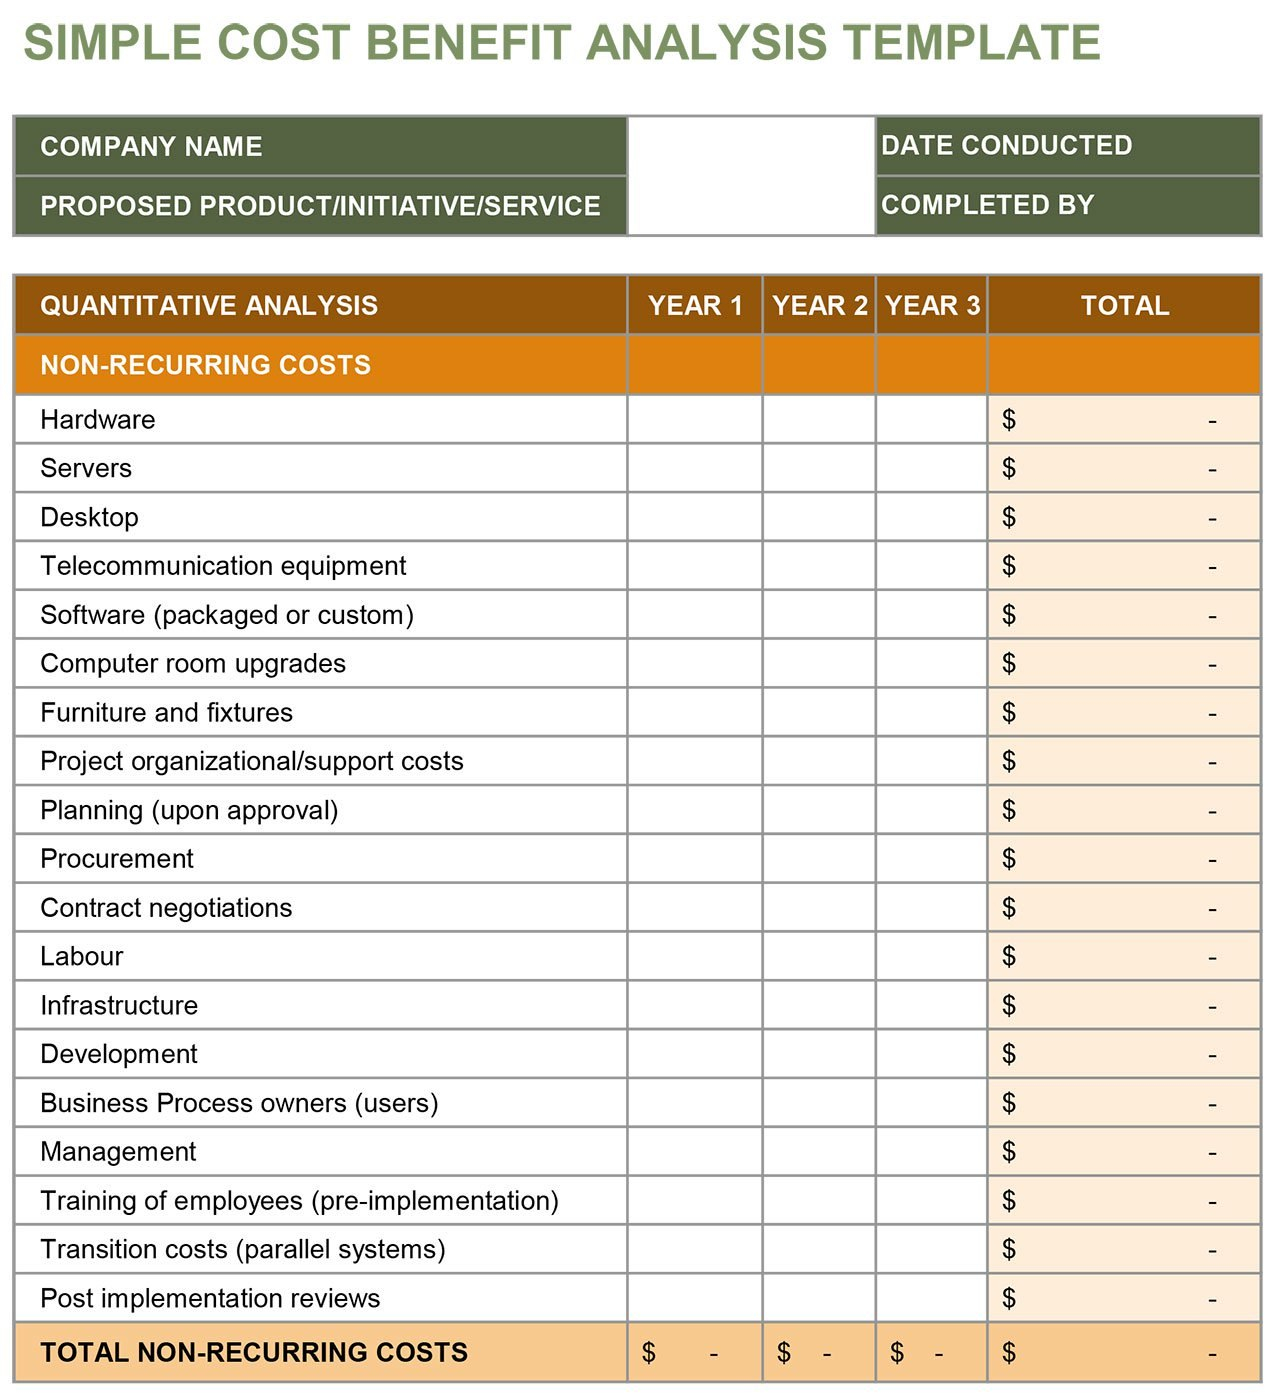 Cost Benefit Analysis An Expert Guide  Smartsheet For Business Case Cost Benefit Analysis Template